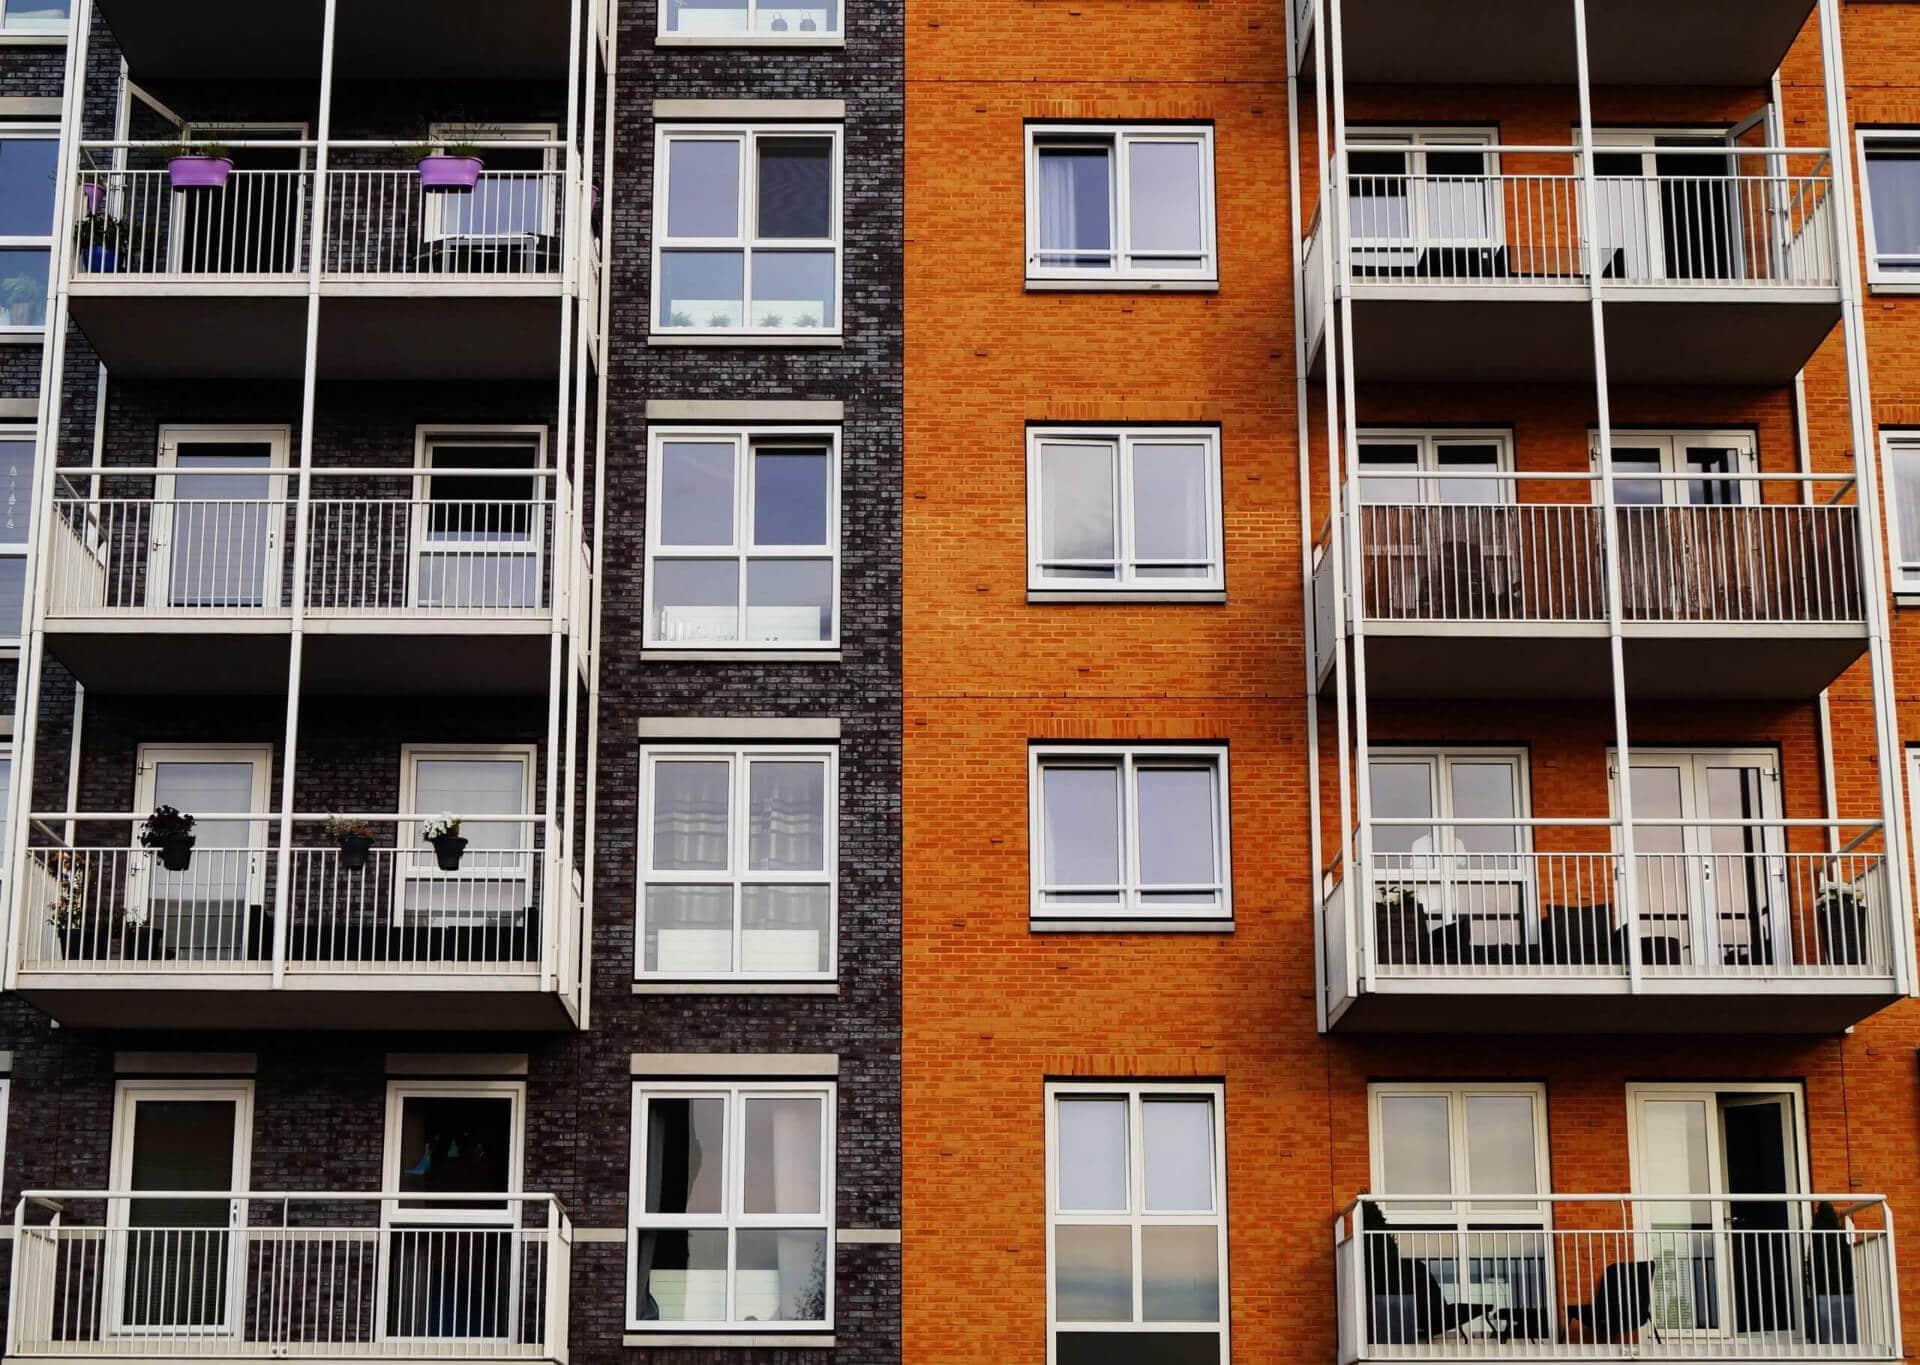 Aantal huishoudens en woningbehoefte Noord-Holland blijft groeien